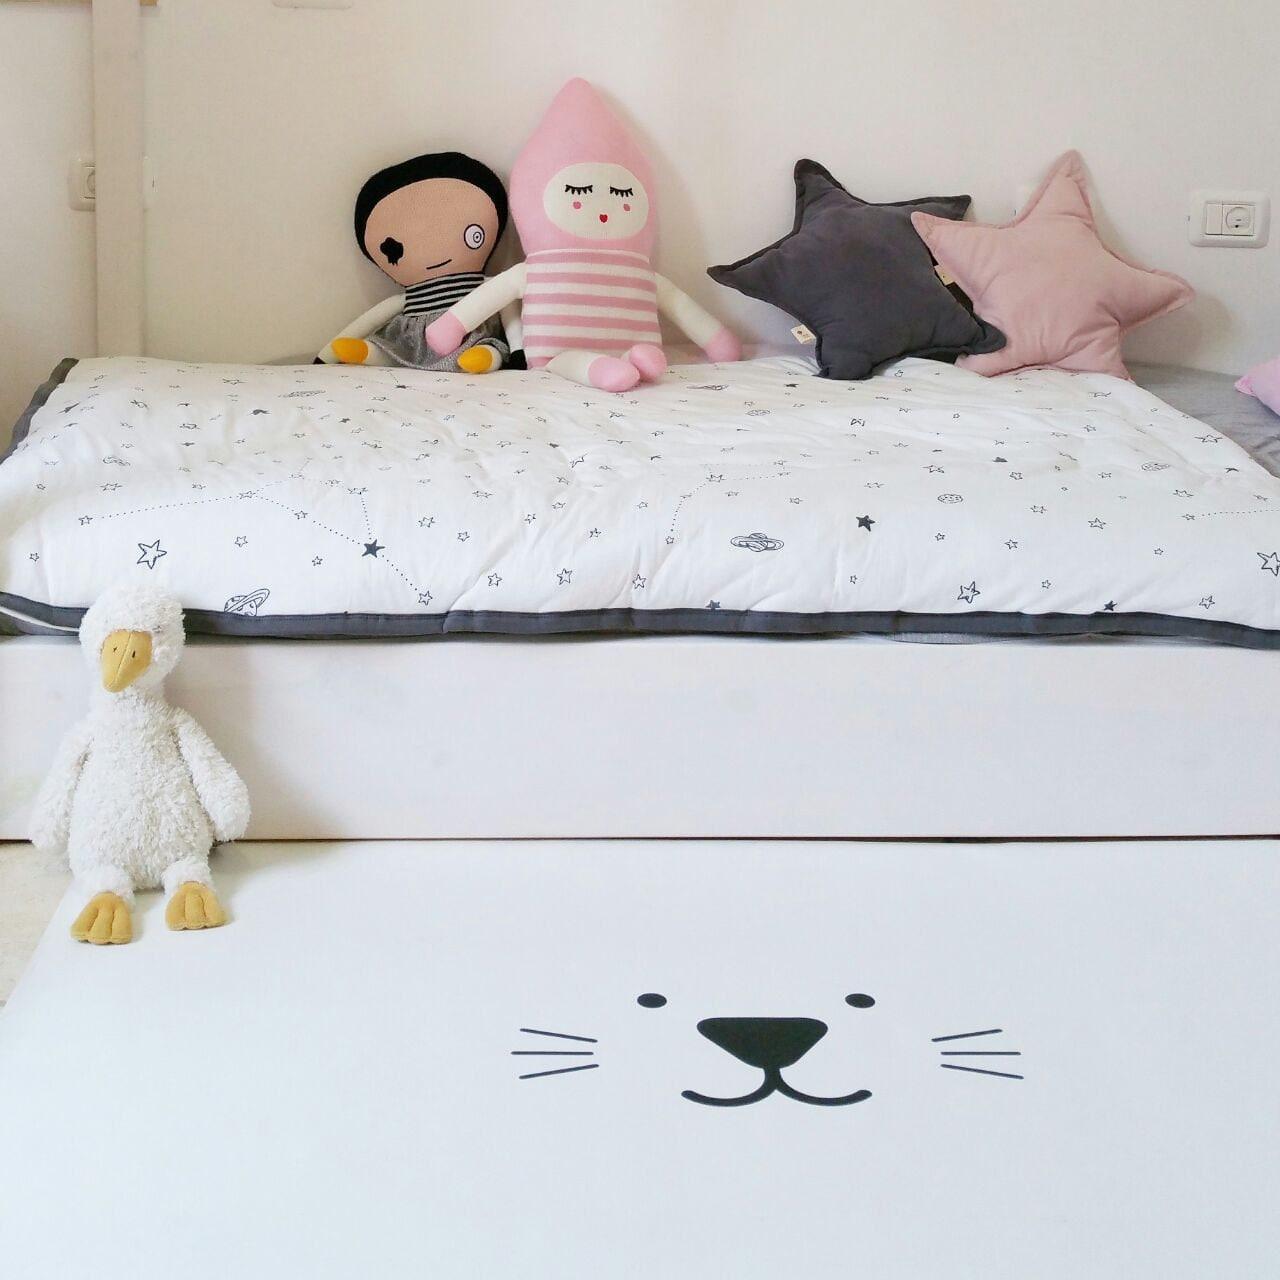 katze kinder teppich monochrom kinderzimmer pvc von petekdesign. Black Bedroom Furniture Sets. Home Design Ideas